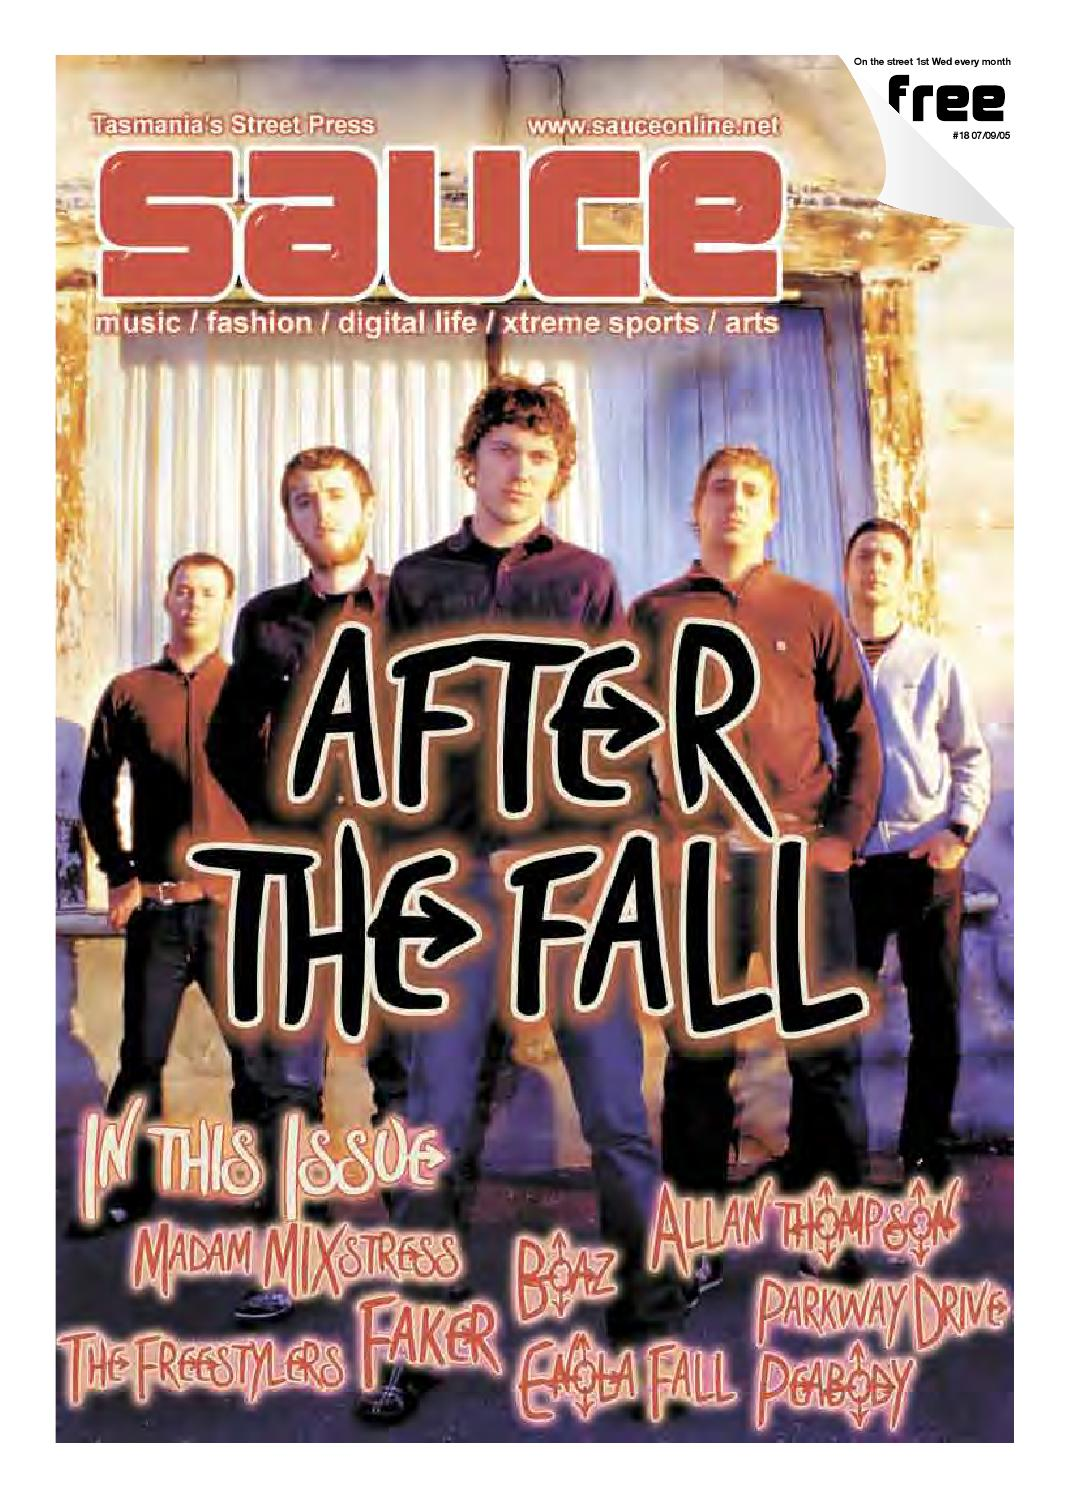 Sauce - Issue 18, 07-09-05 by David K Q Williams - issuu